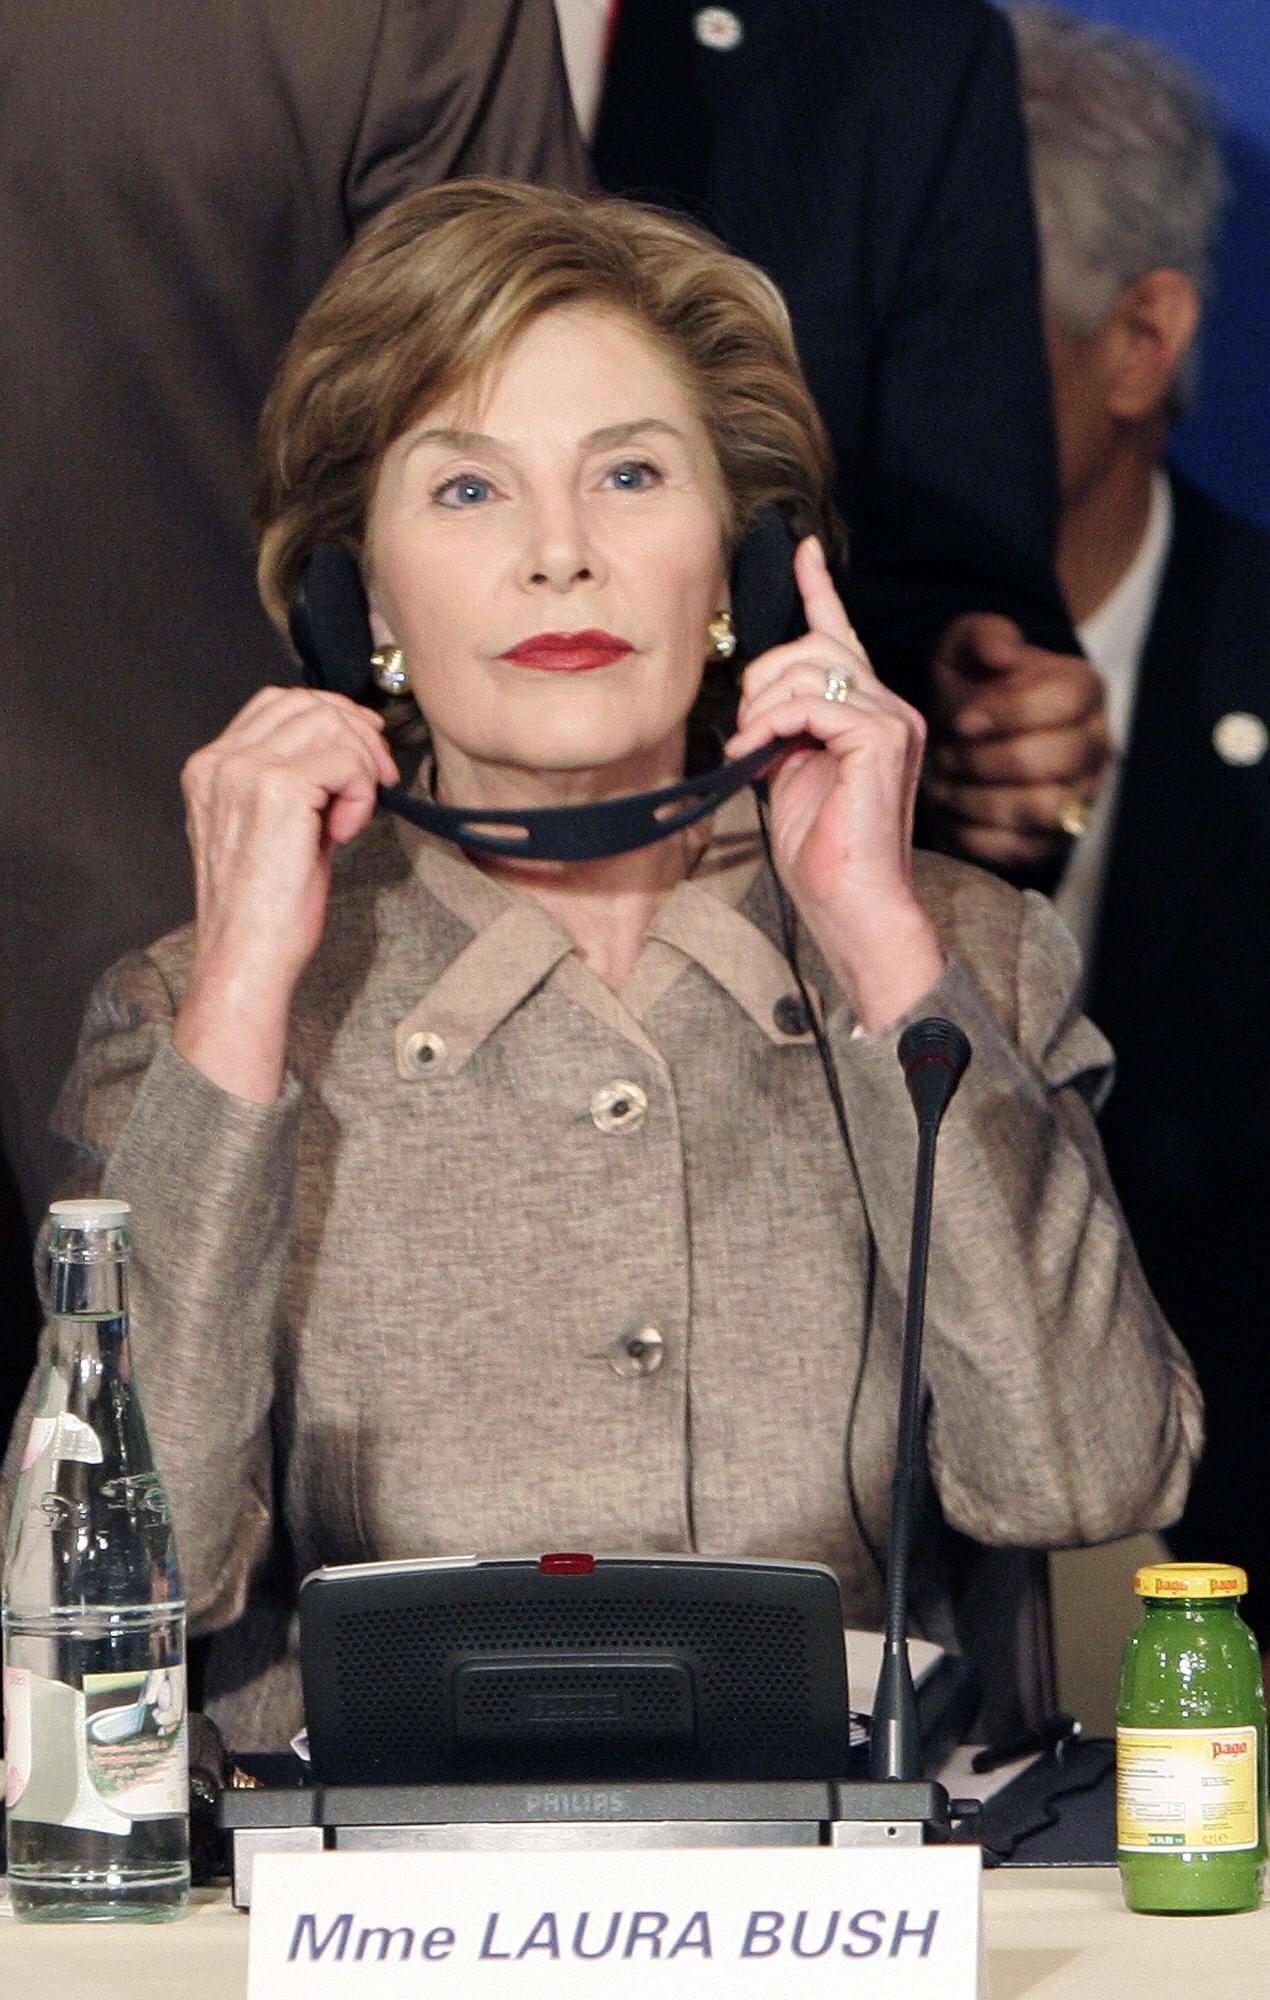 Laura Bush announced the US pledge of $10.2 billion.